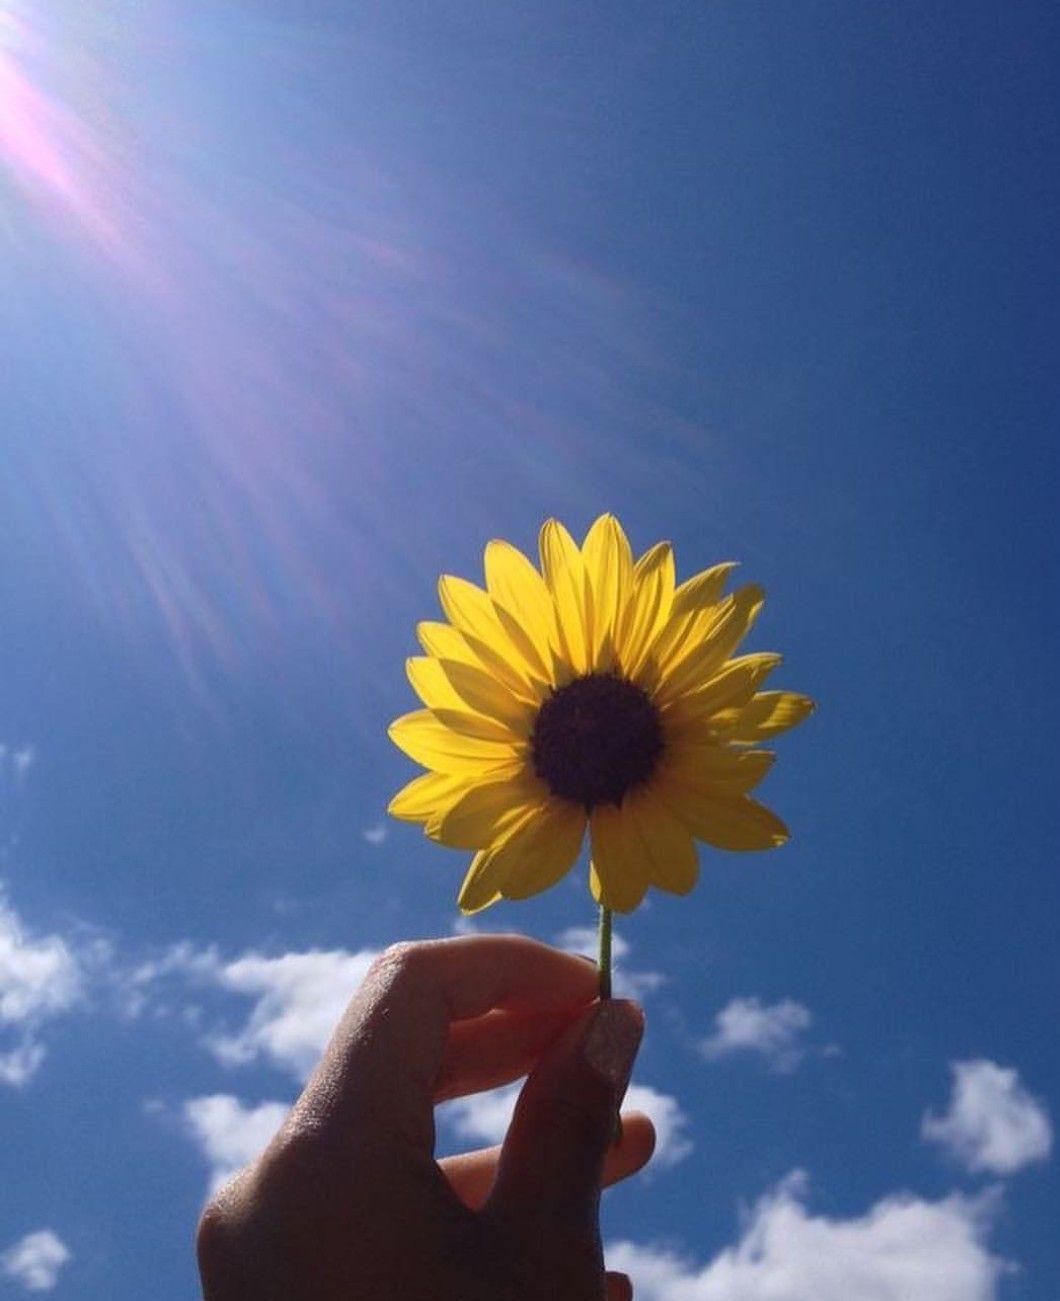 Download Sunflower Wallpaper, Aesthetic Wallpapers, Sun ...